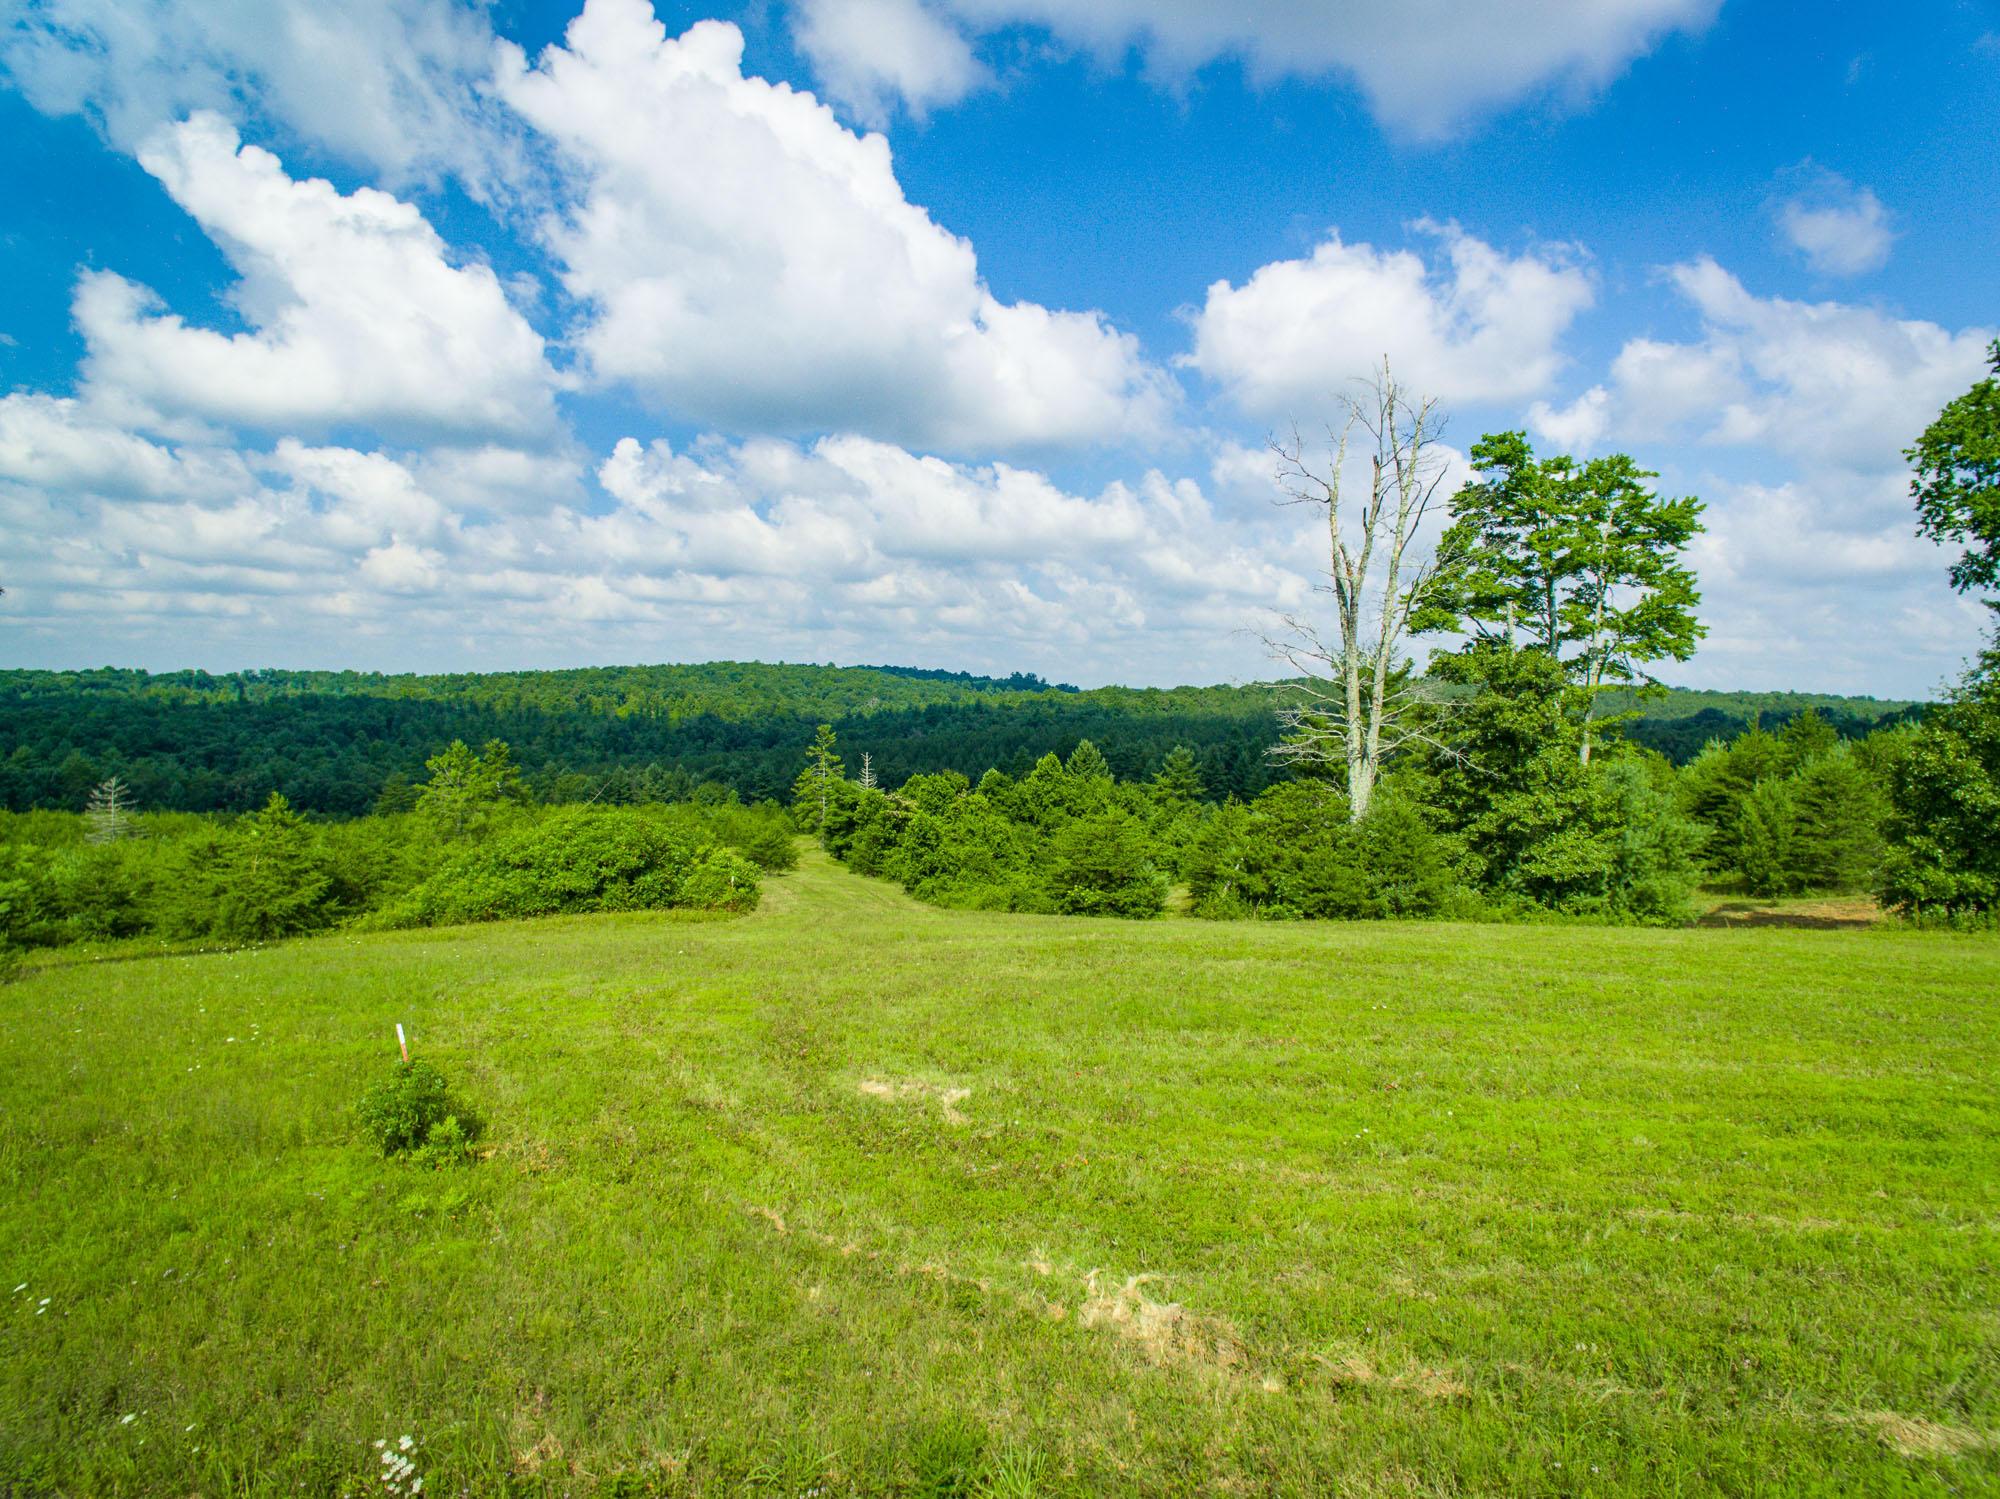 Lot 3 Mountain View Drive, Deer Lodge, TN 37726